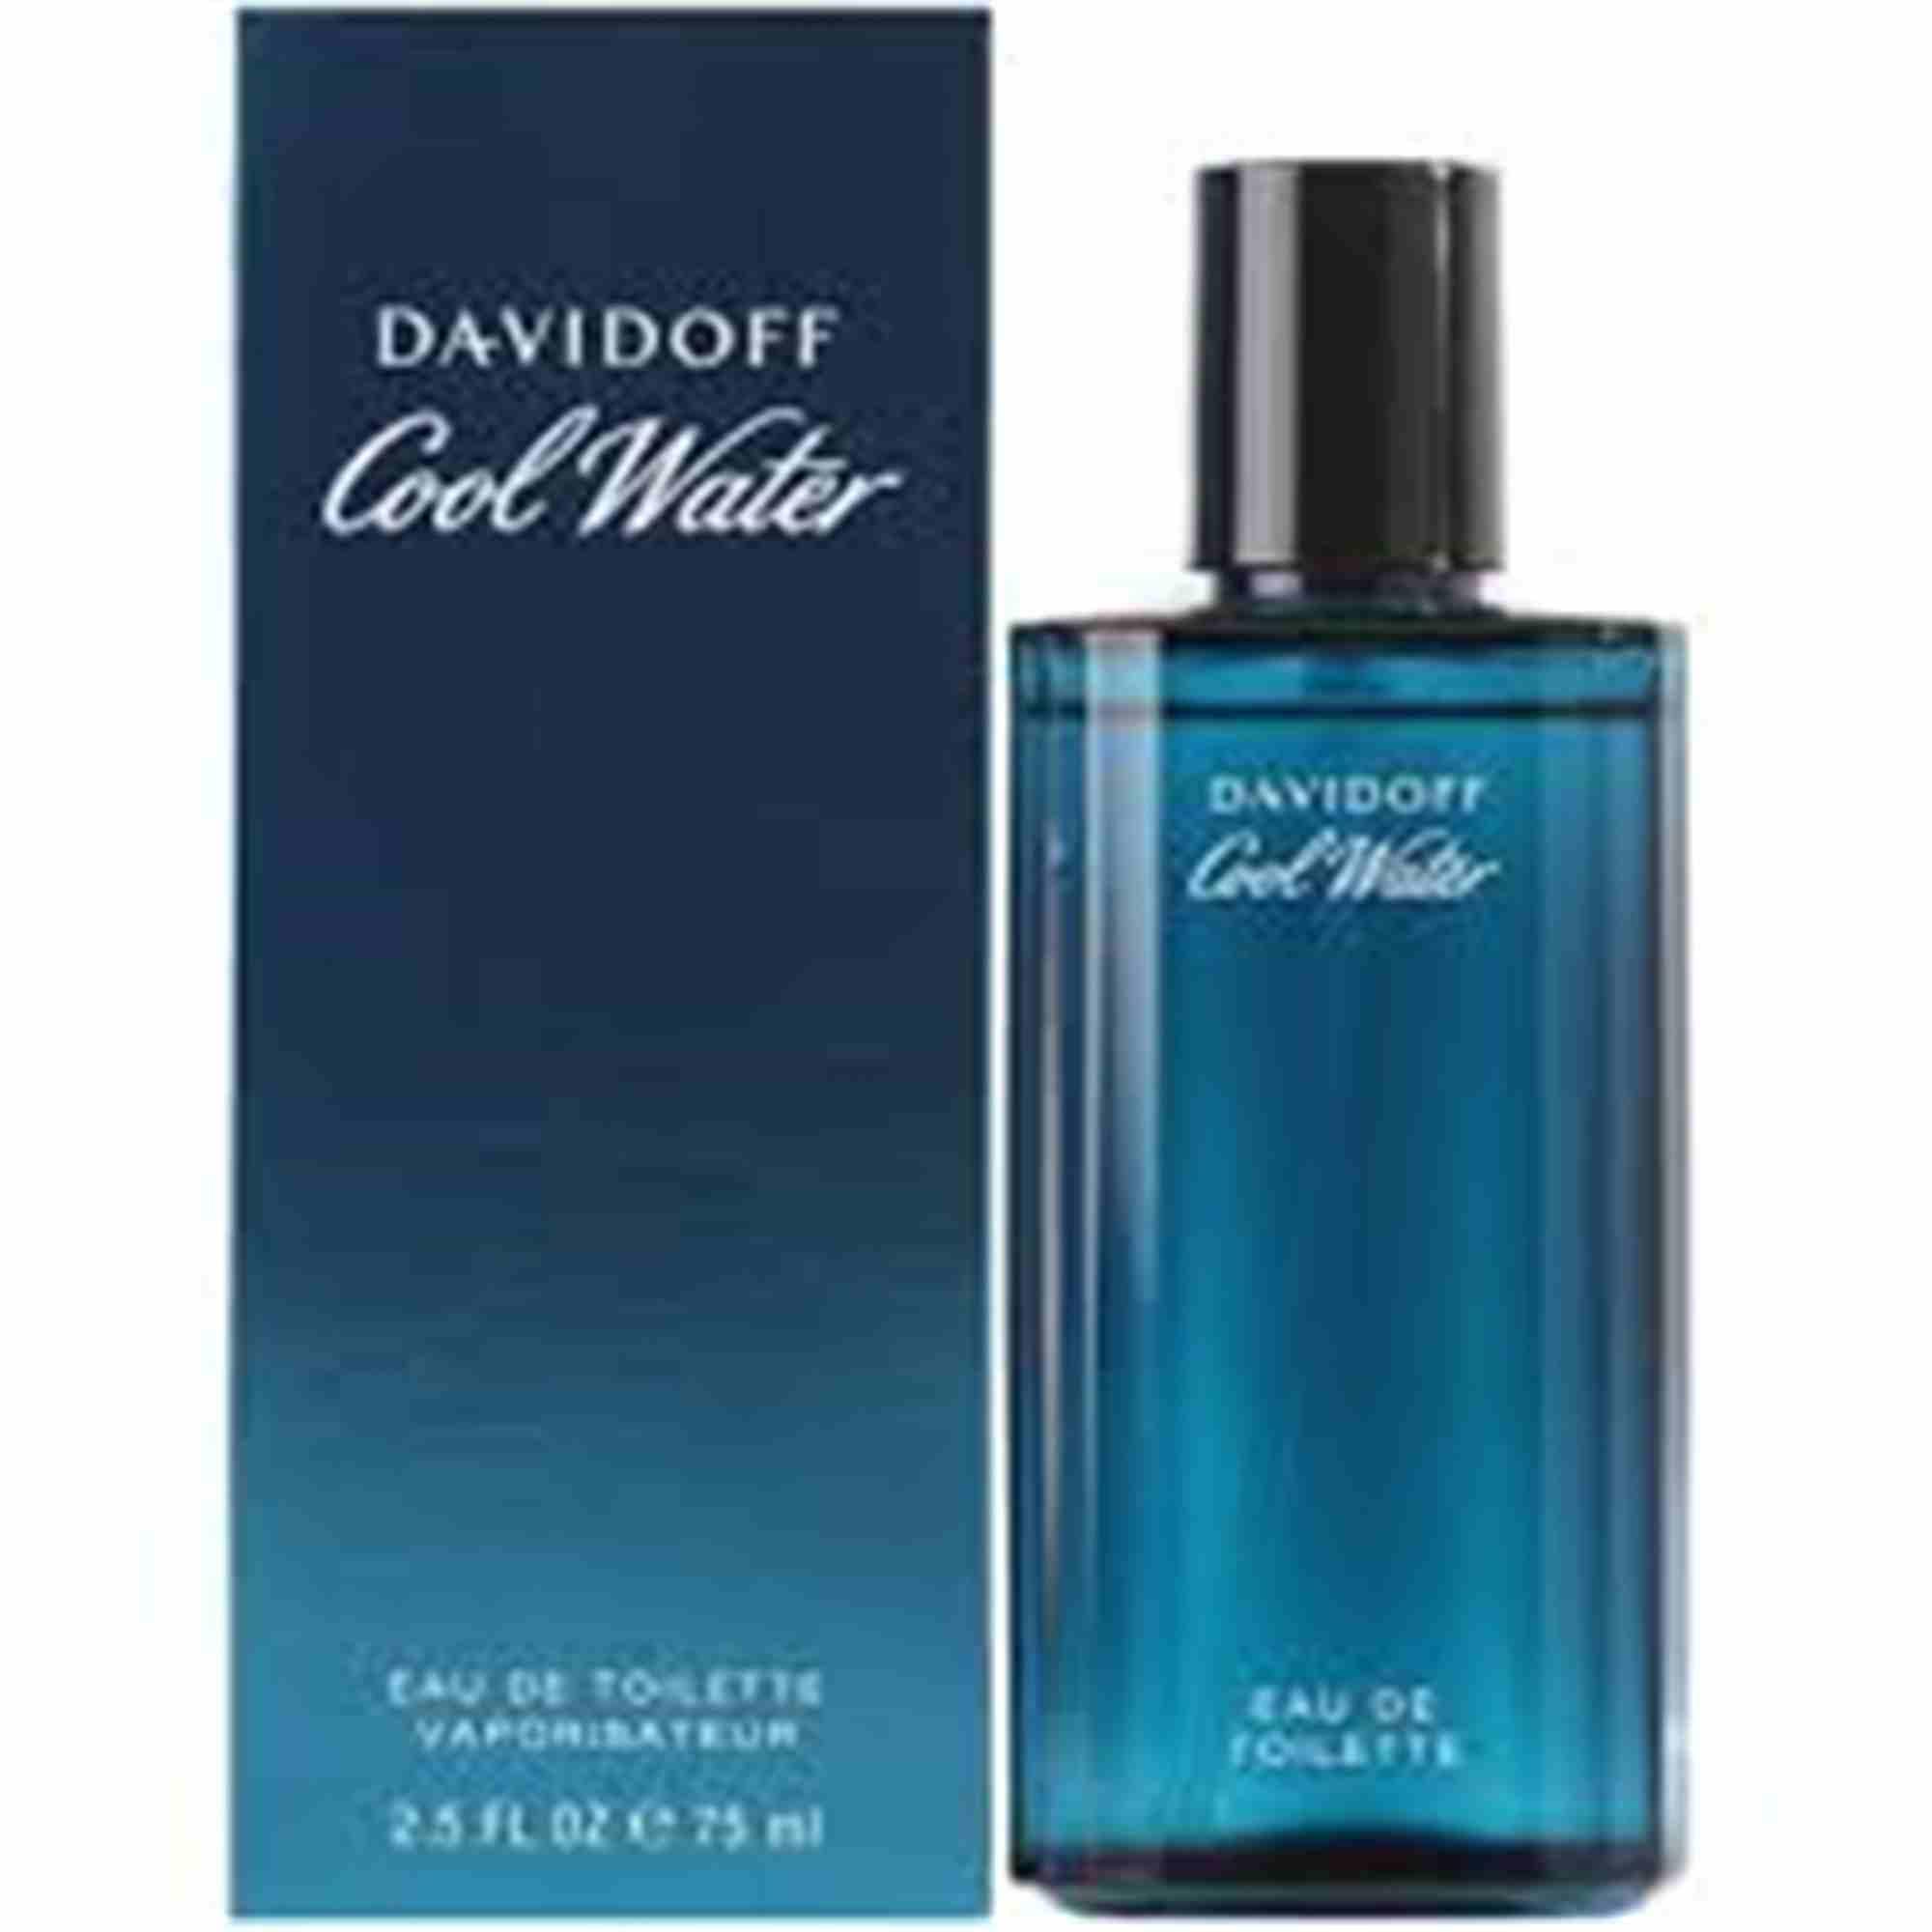 Davidoff Cool Water For Men Perfume 75 ML